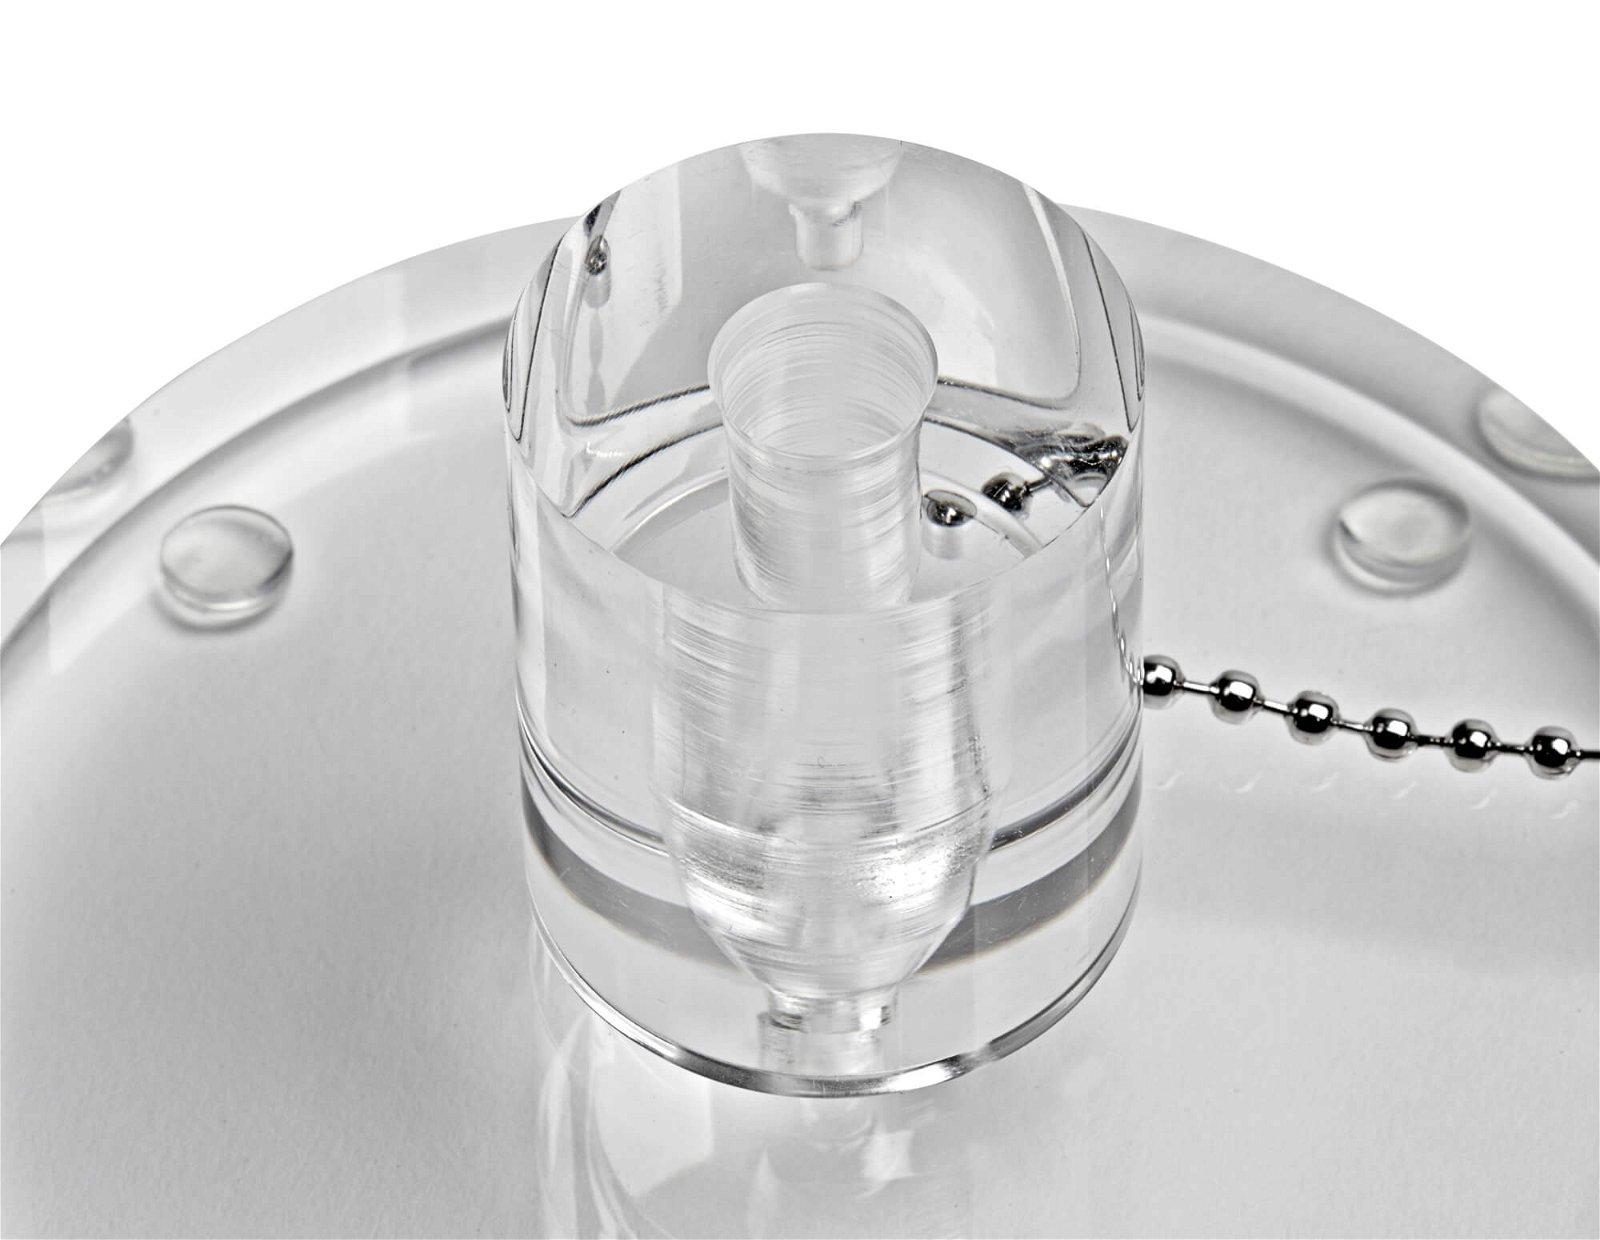 Acryl-Kuliständer, glasklar